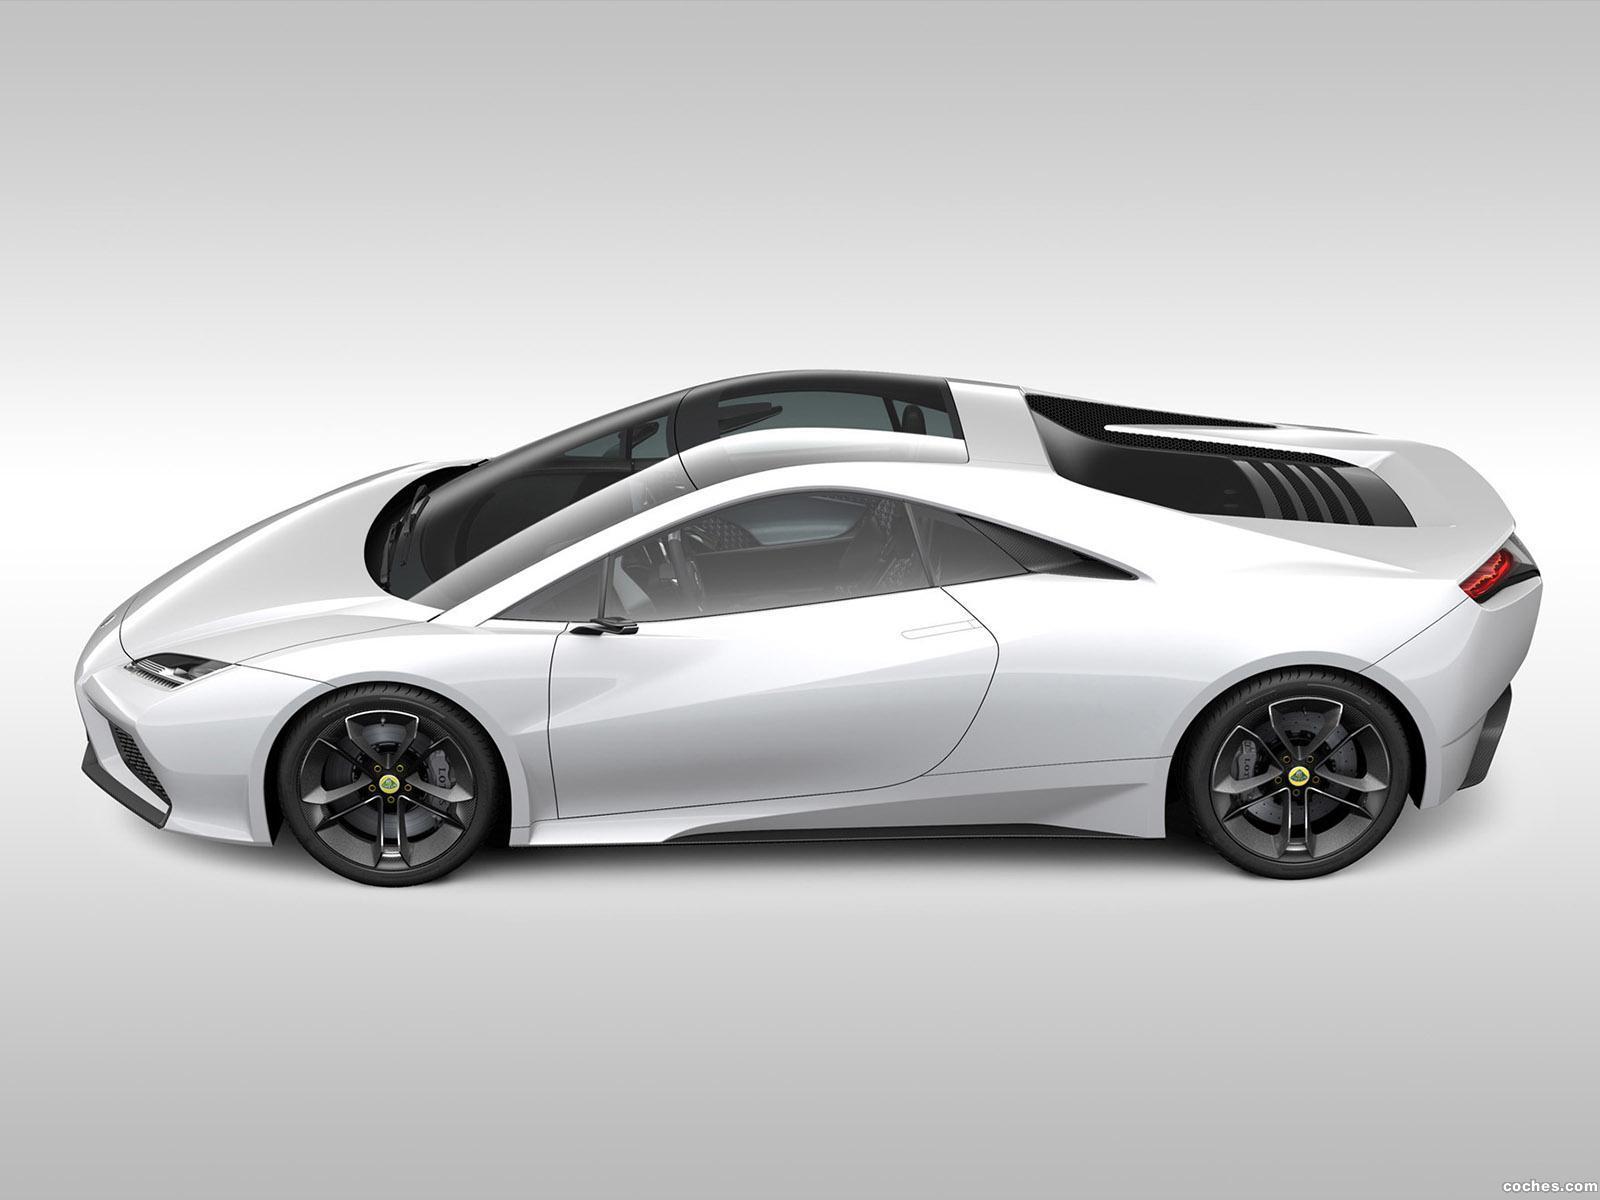 Foto 1 de Lotus Esprit Concept 2010